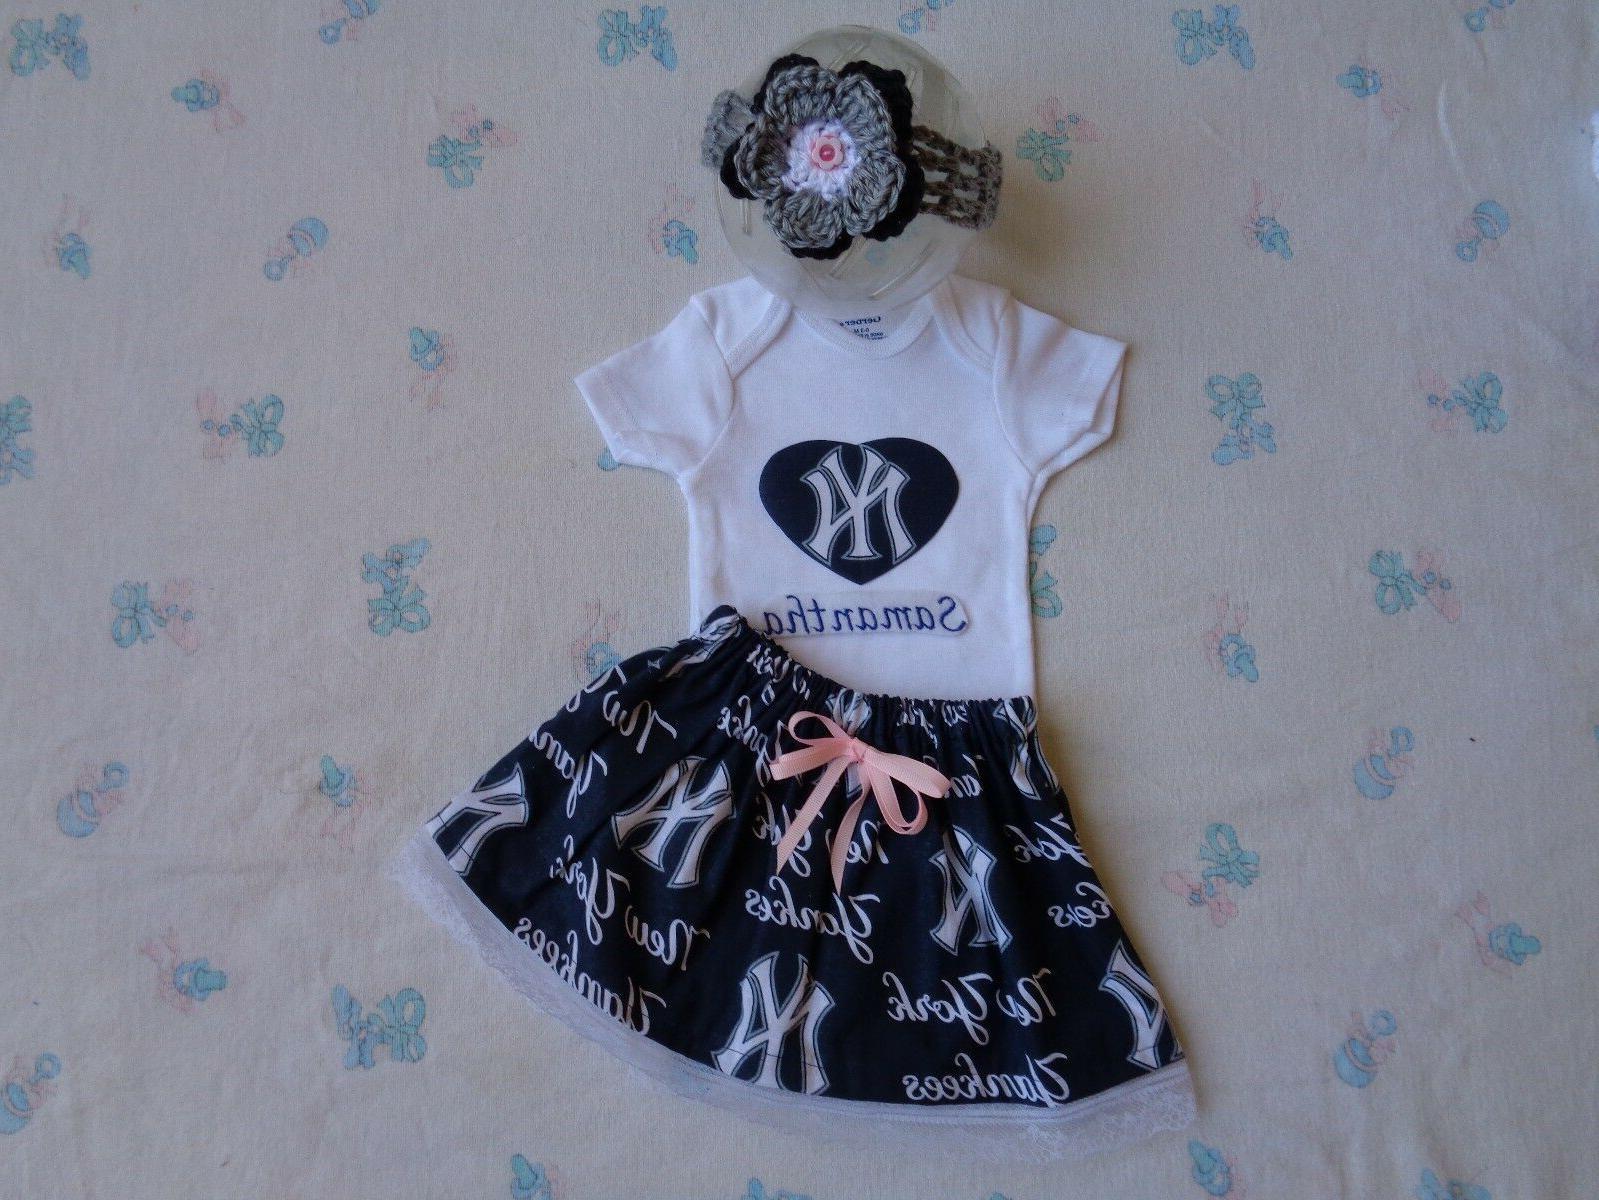 new york yankees baby girl skirt personalized